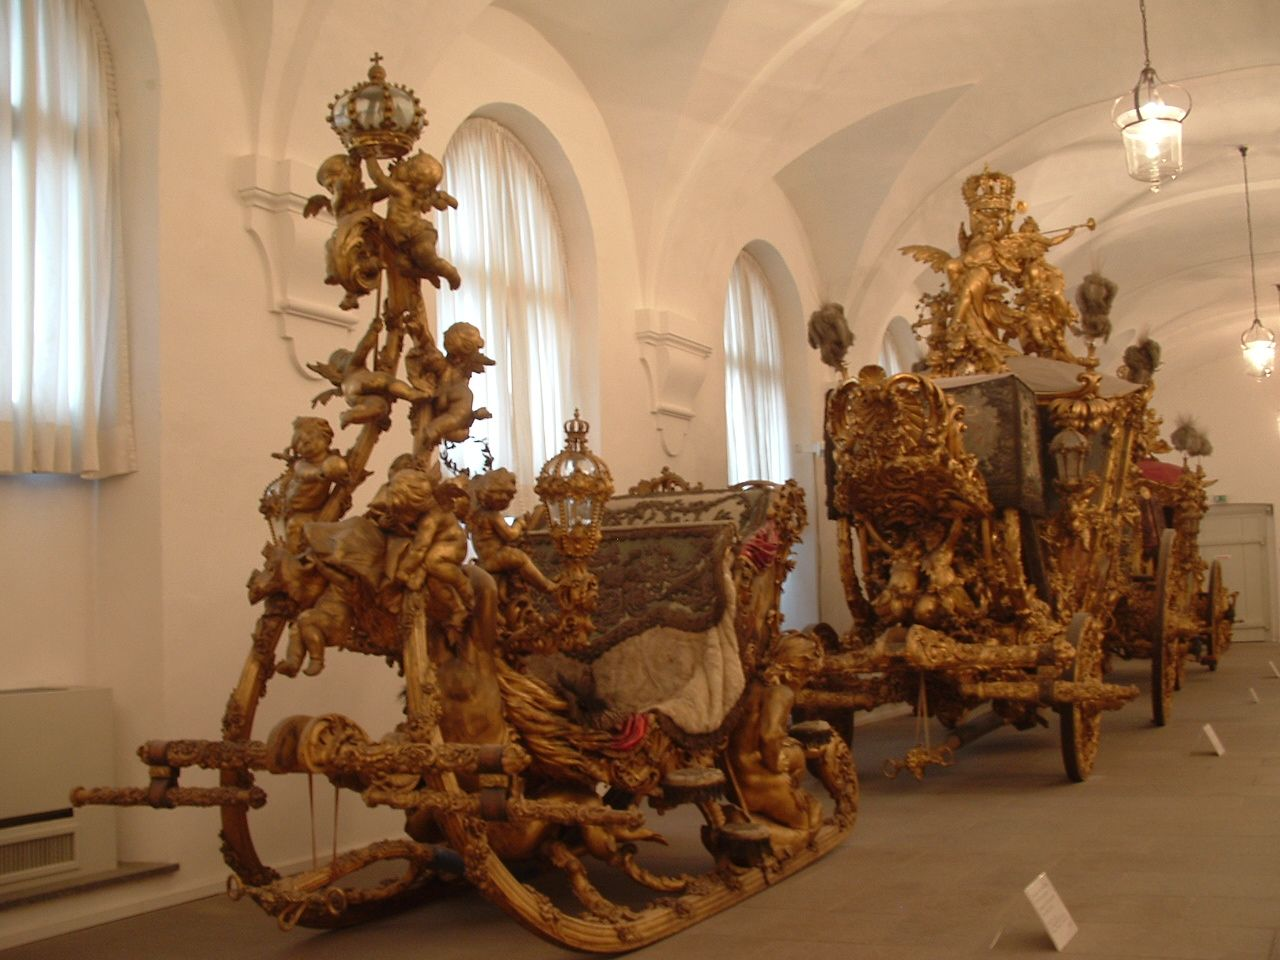 Sleighs Of King Ludwig Ii Http Www Mcdonogh Org German Summer07 11 20june 2026 20 20munich 20 20day 202 17 20s Neuschwanstein Castle Germany Castles Sleigh